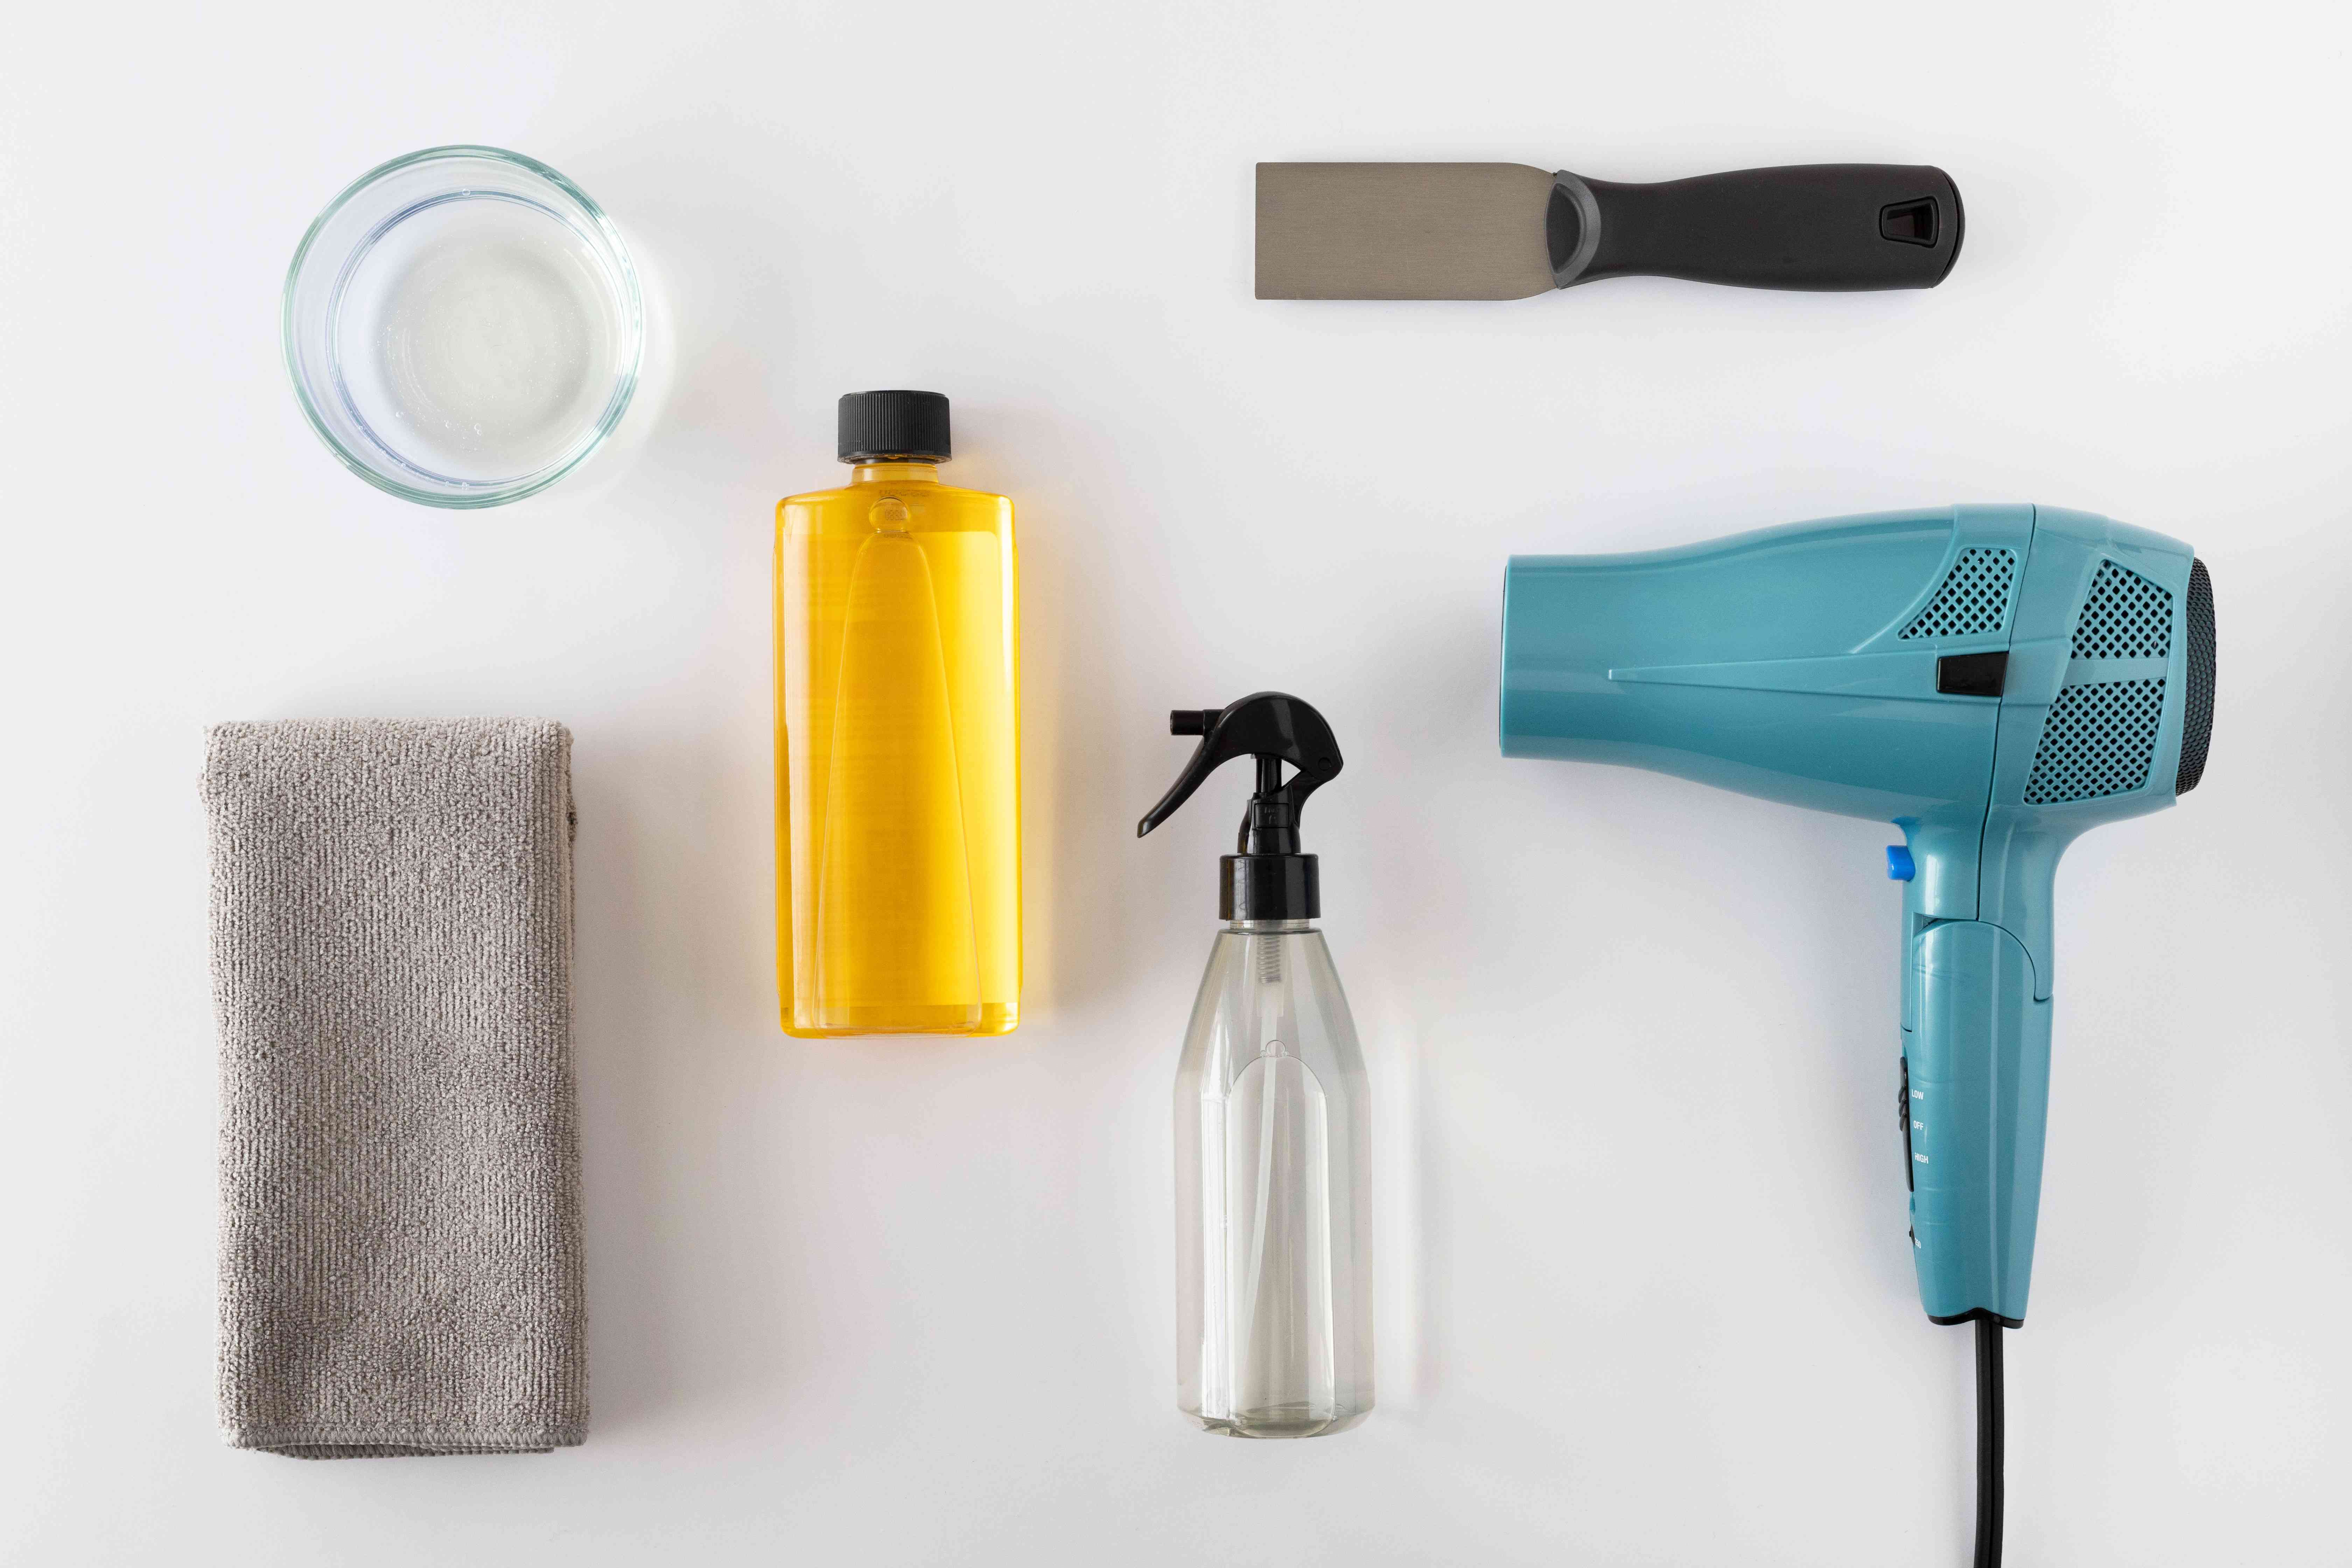 items for removing shelf liner